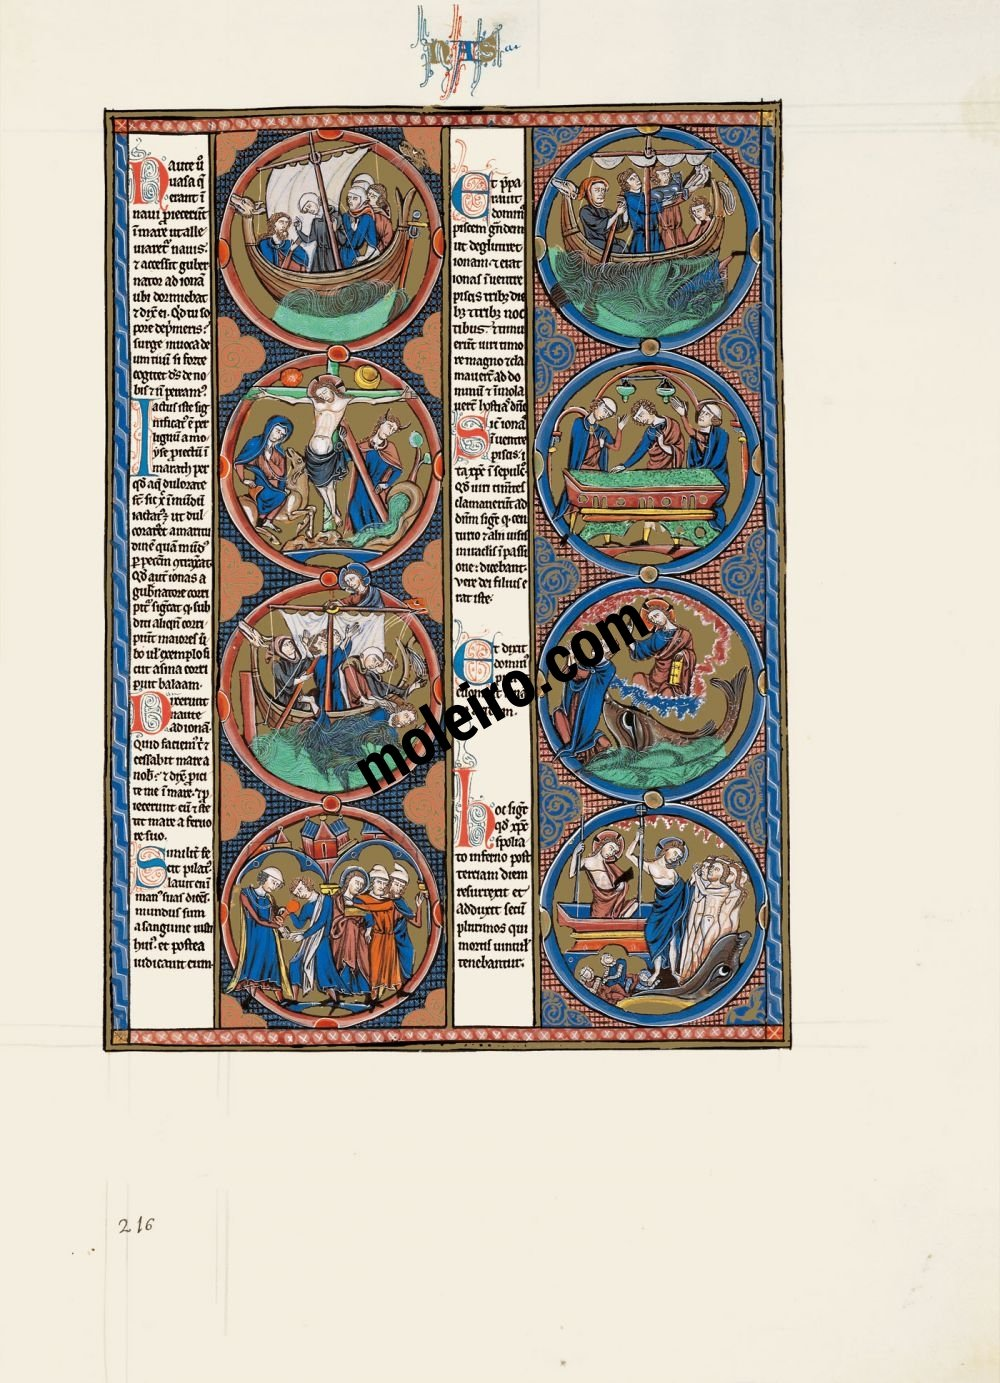 La Bible de Saint Louis vol.2, f. 216r